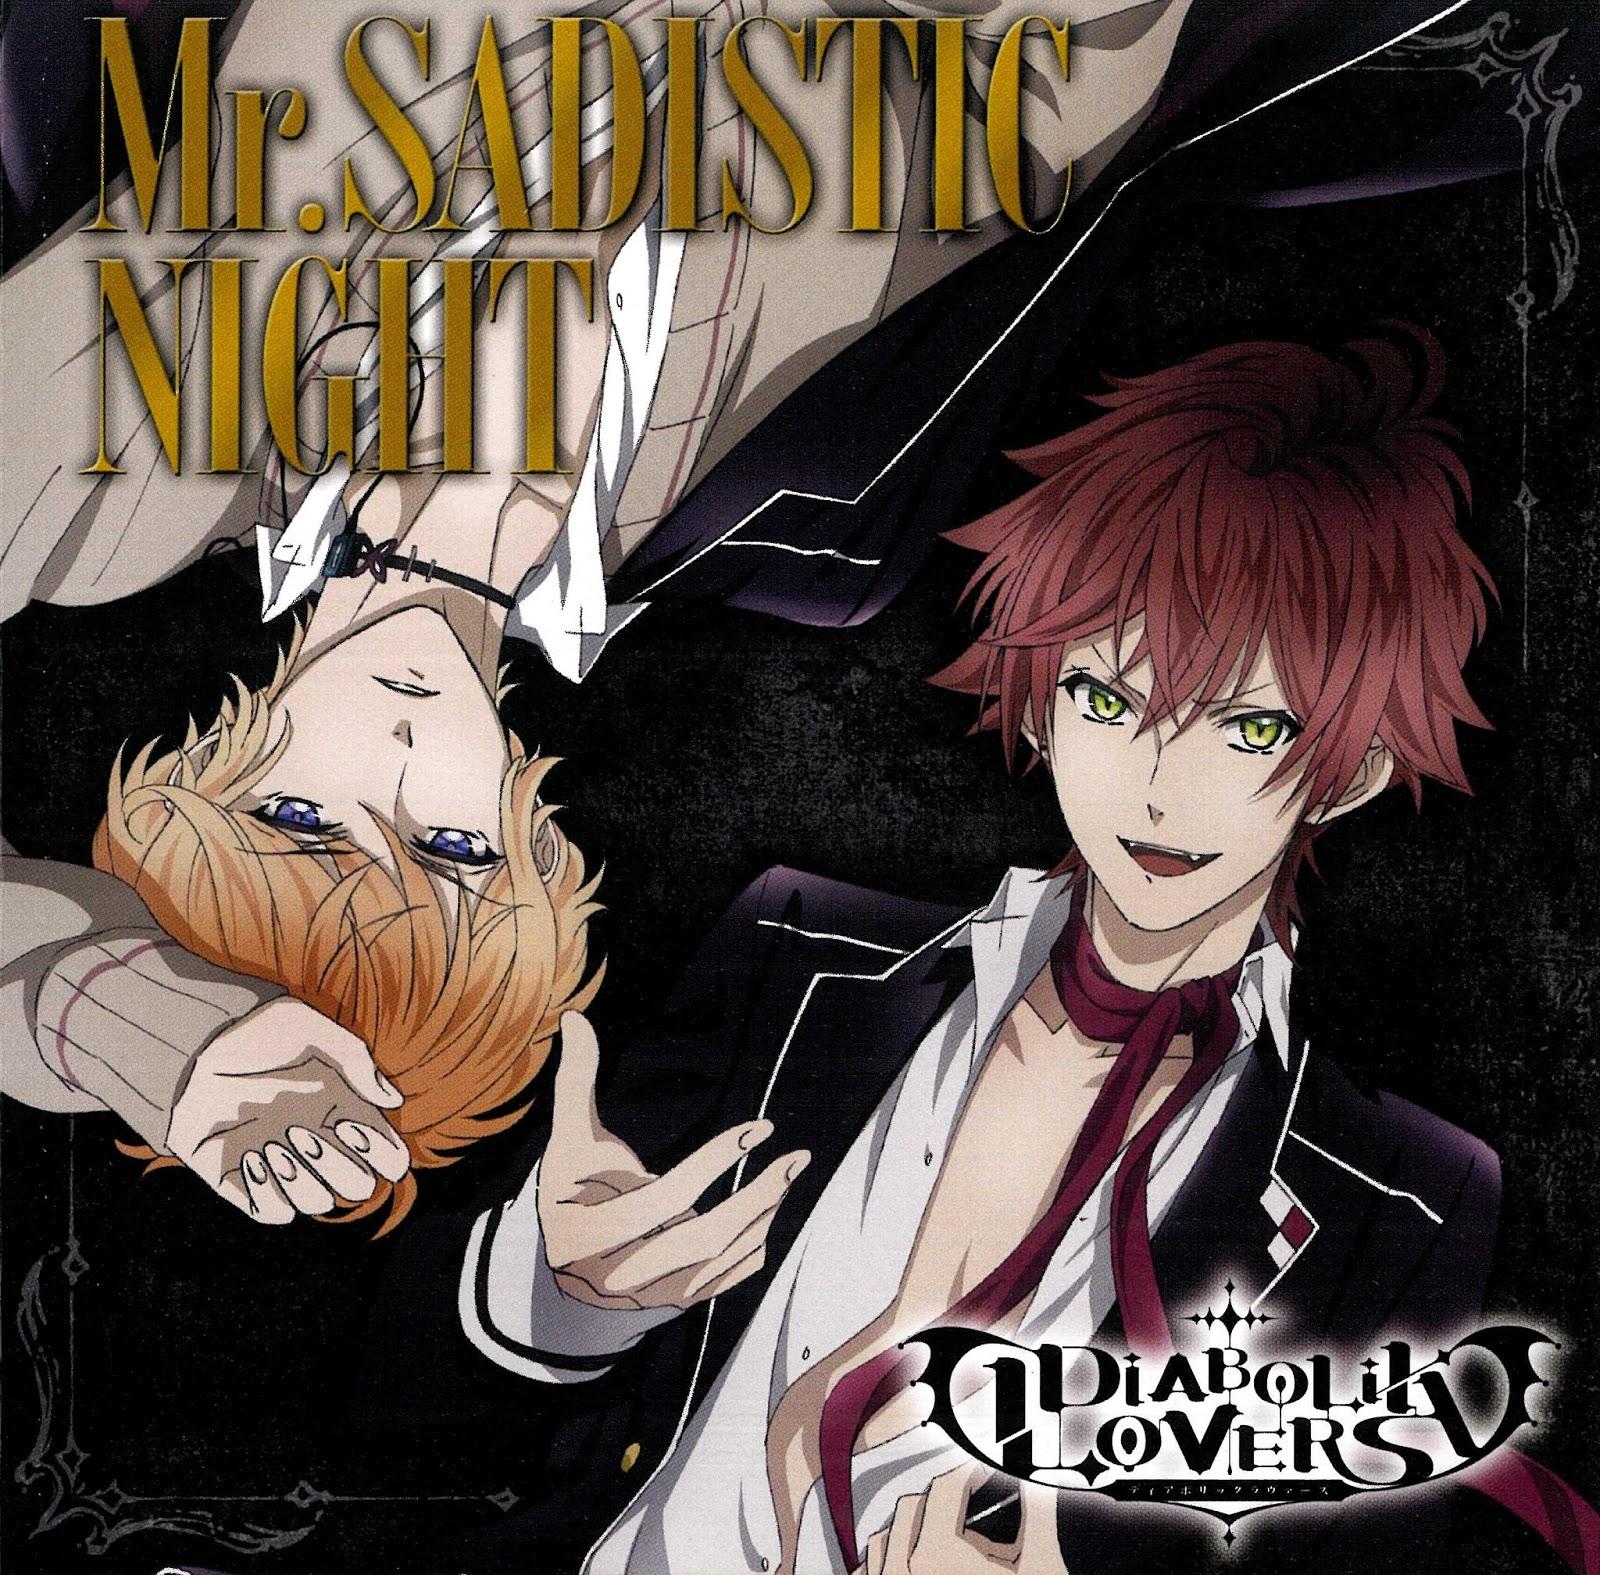 Diabolik Lovers Sadistic Night : 漢字クロス : 漢字